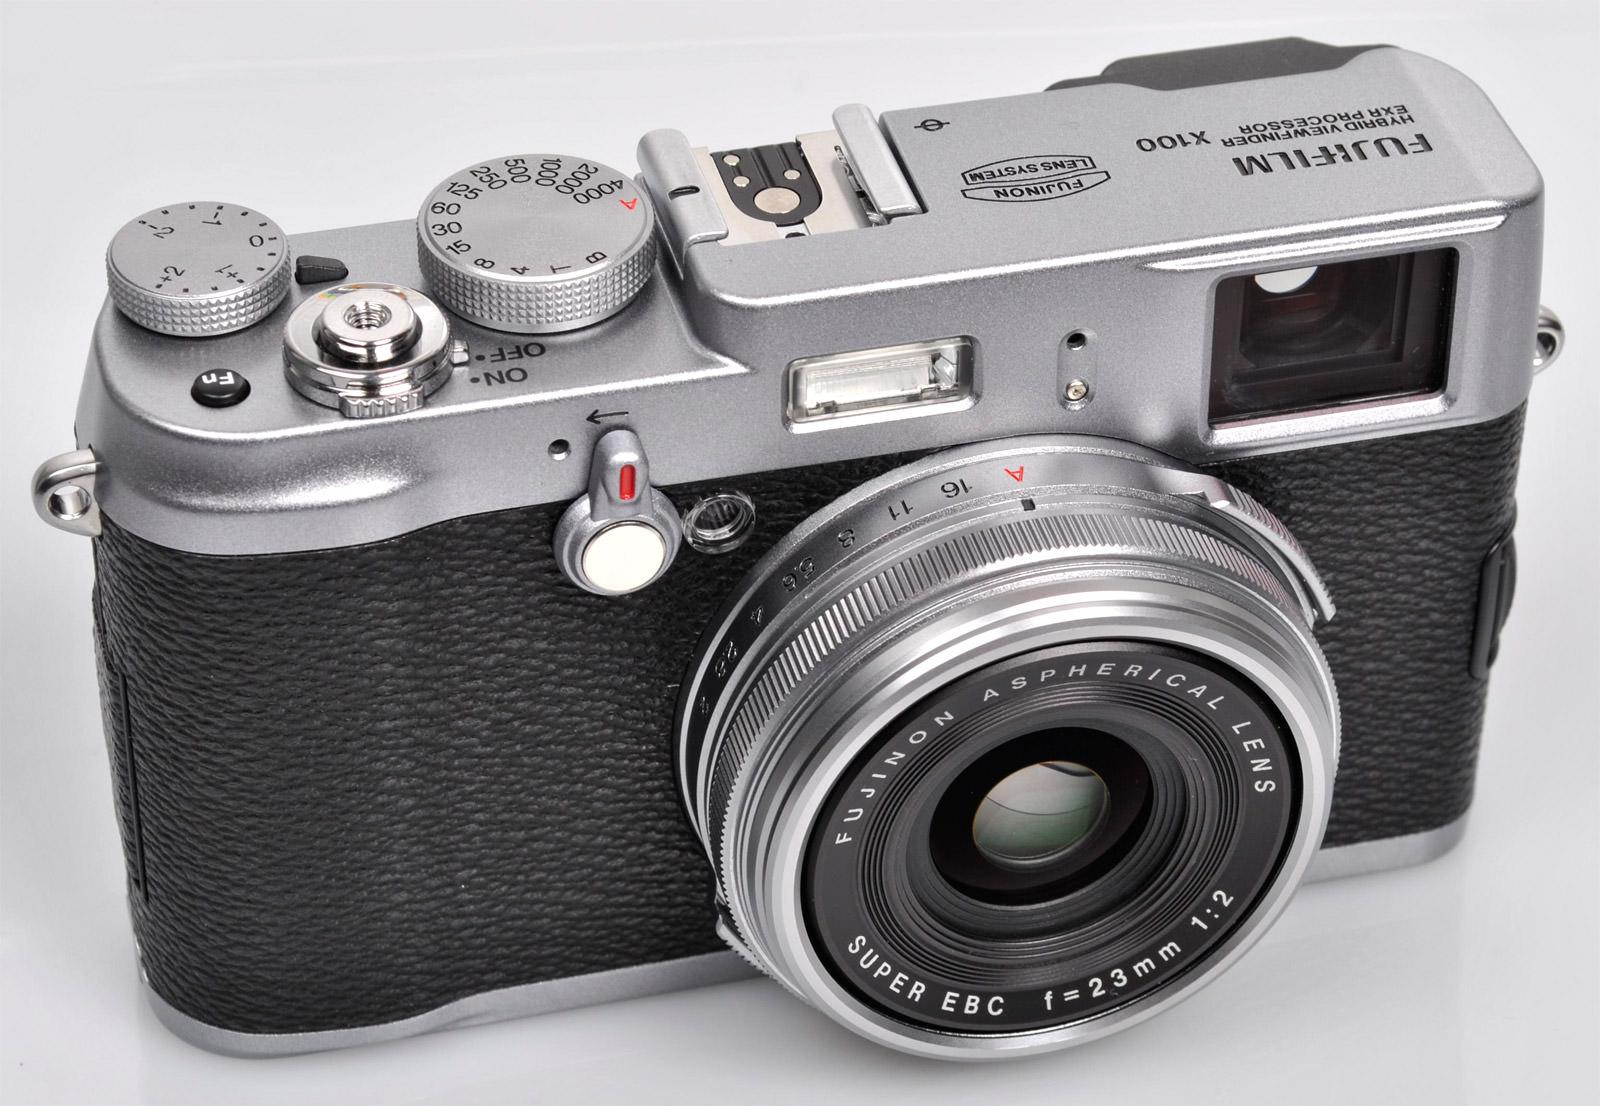 Fujifilm FinePix X100 Digital Camera Review